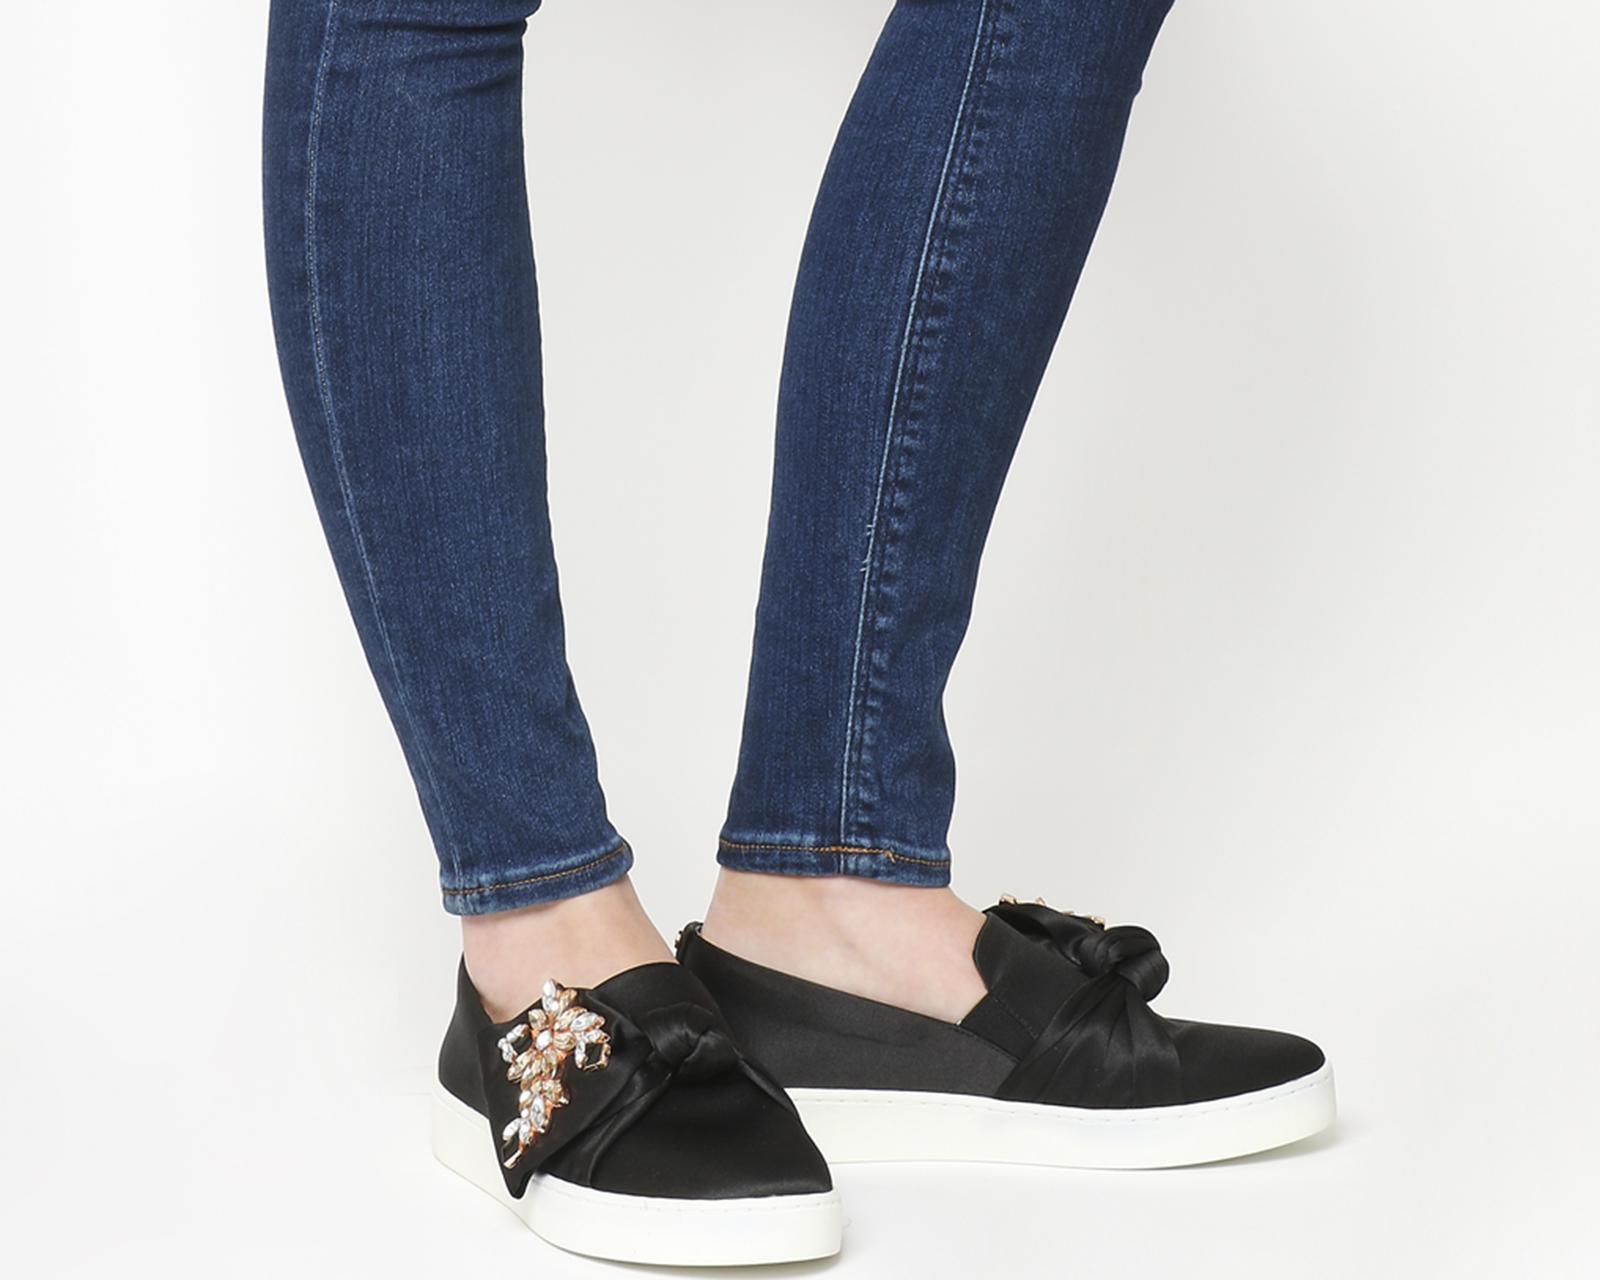 58ebe0a98b0a11 Ted Baker Tinzel Slip On Sneaker in Black - Lyst